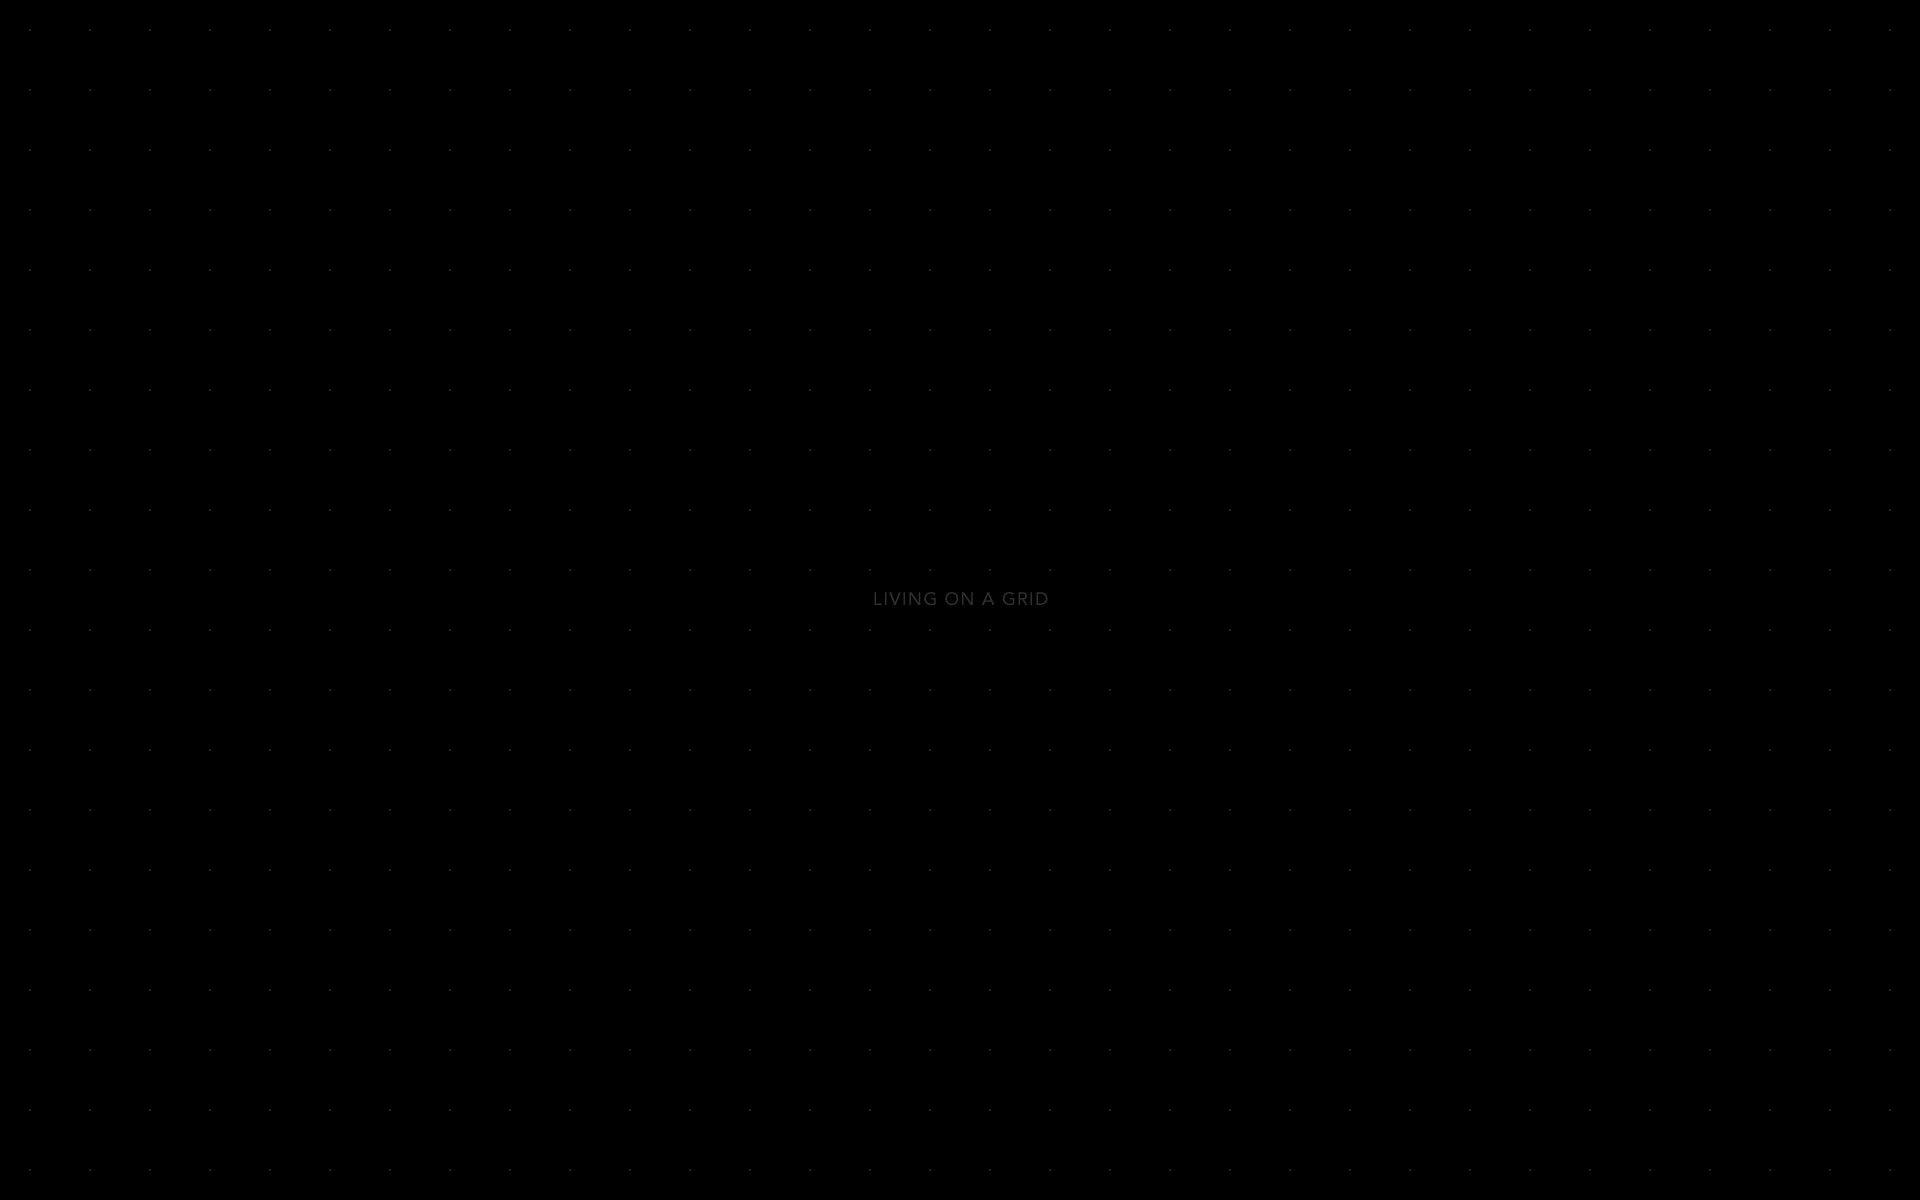 Desktop Background Is Black